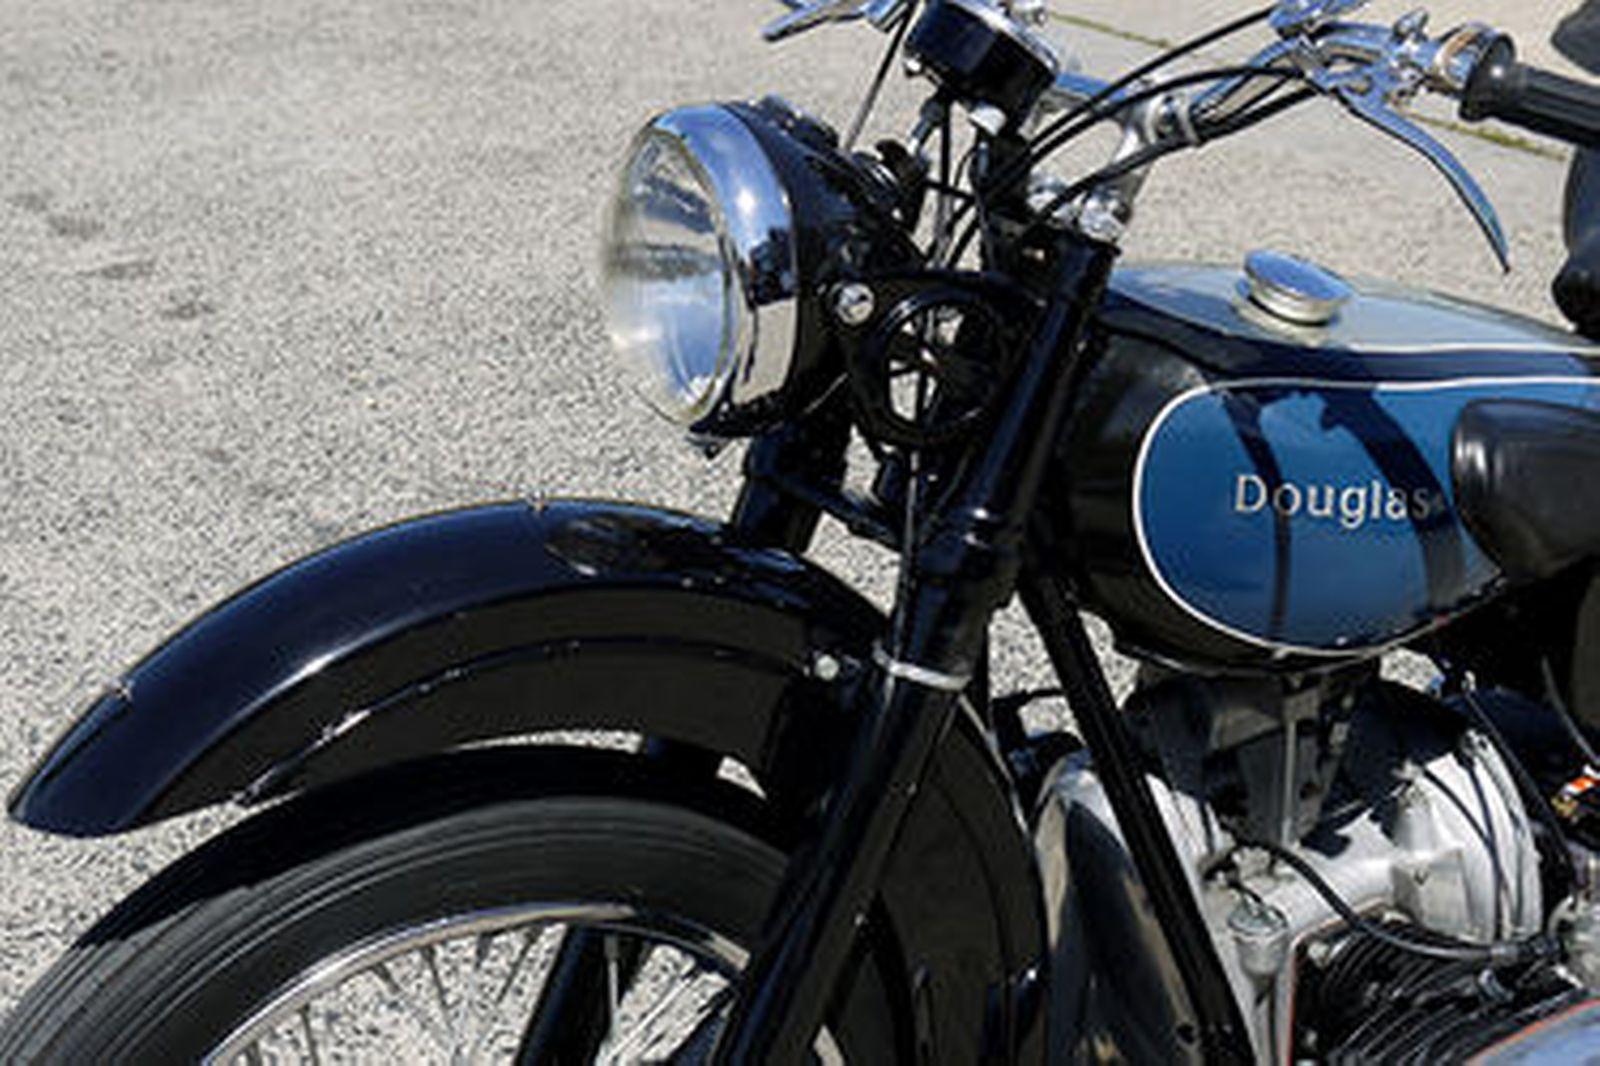 Douglas 350T Motorcycle